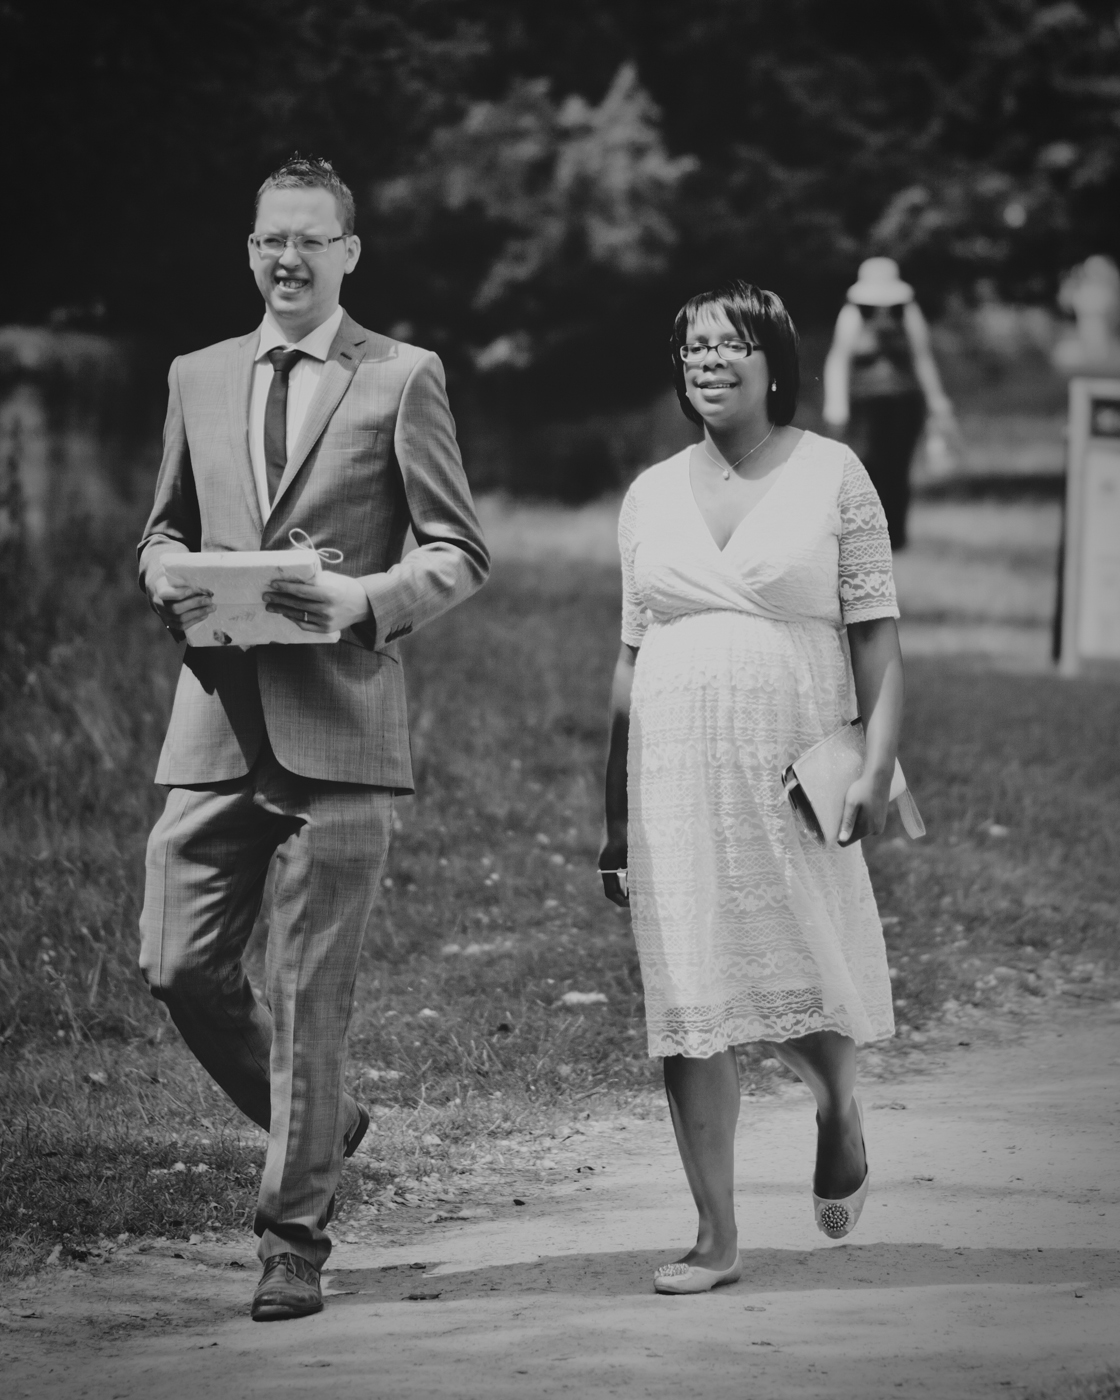 034 - Abi and Chris at Kedleston Hall - Wedding Photography by Mark Pugh www.markpugh.com - 0064.JPG